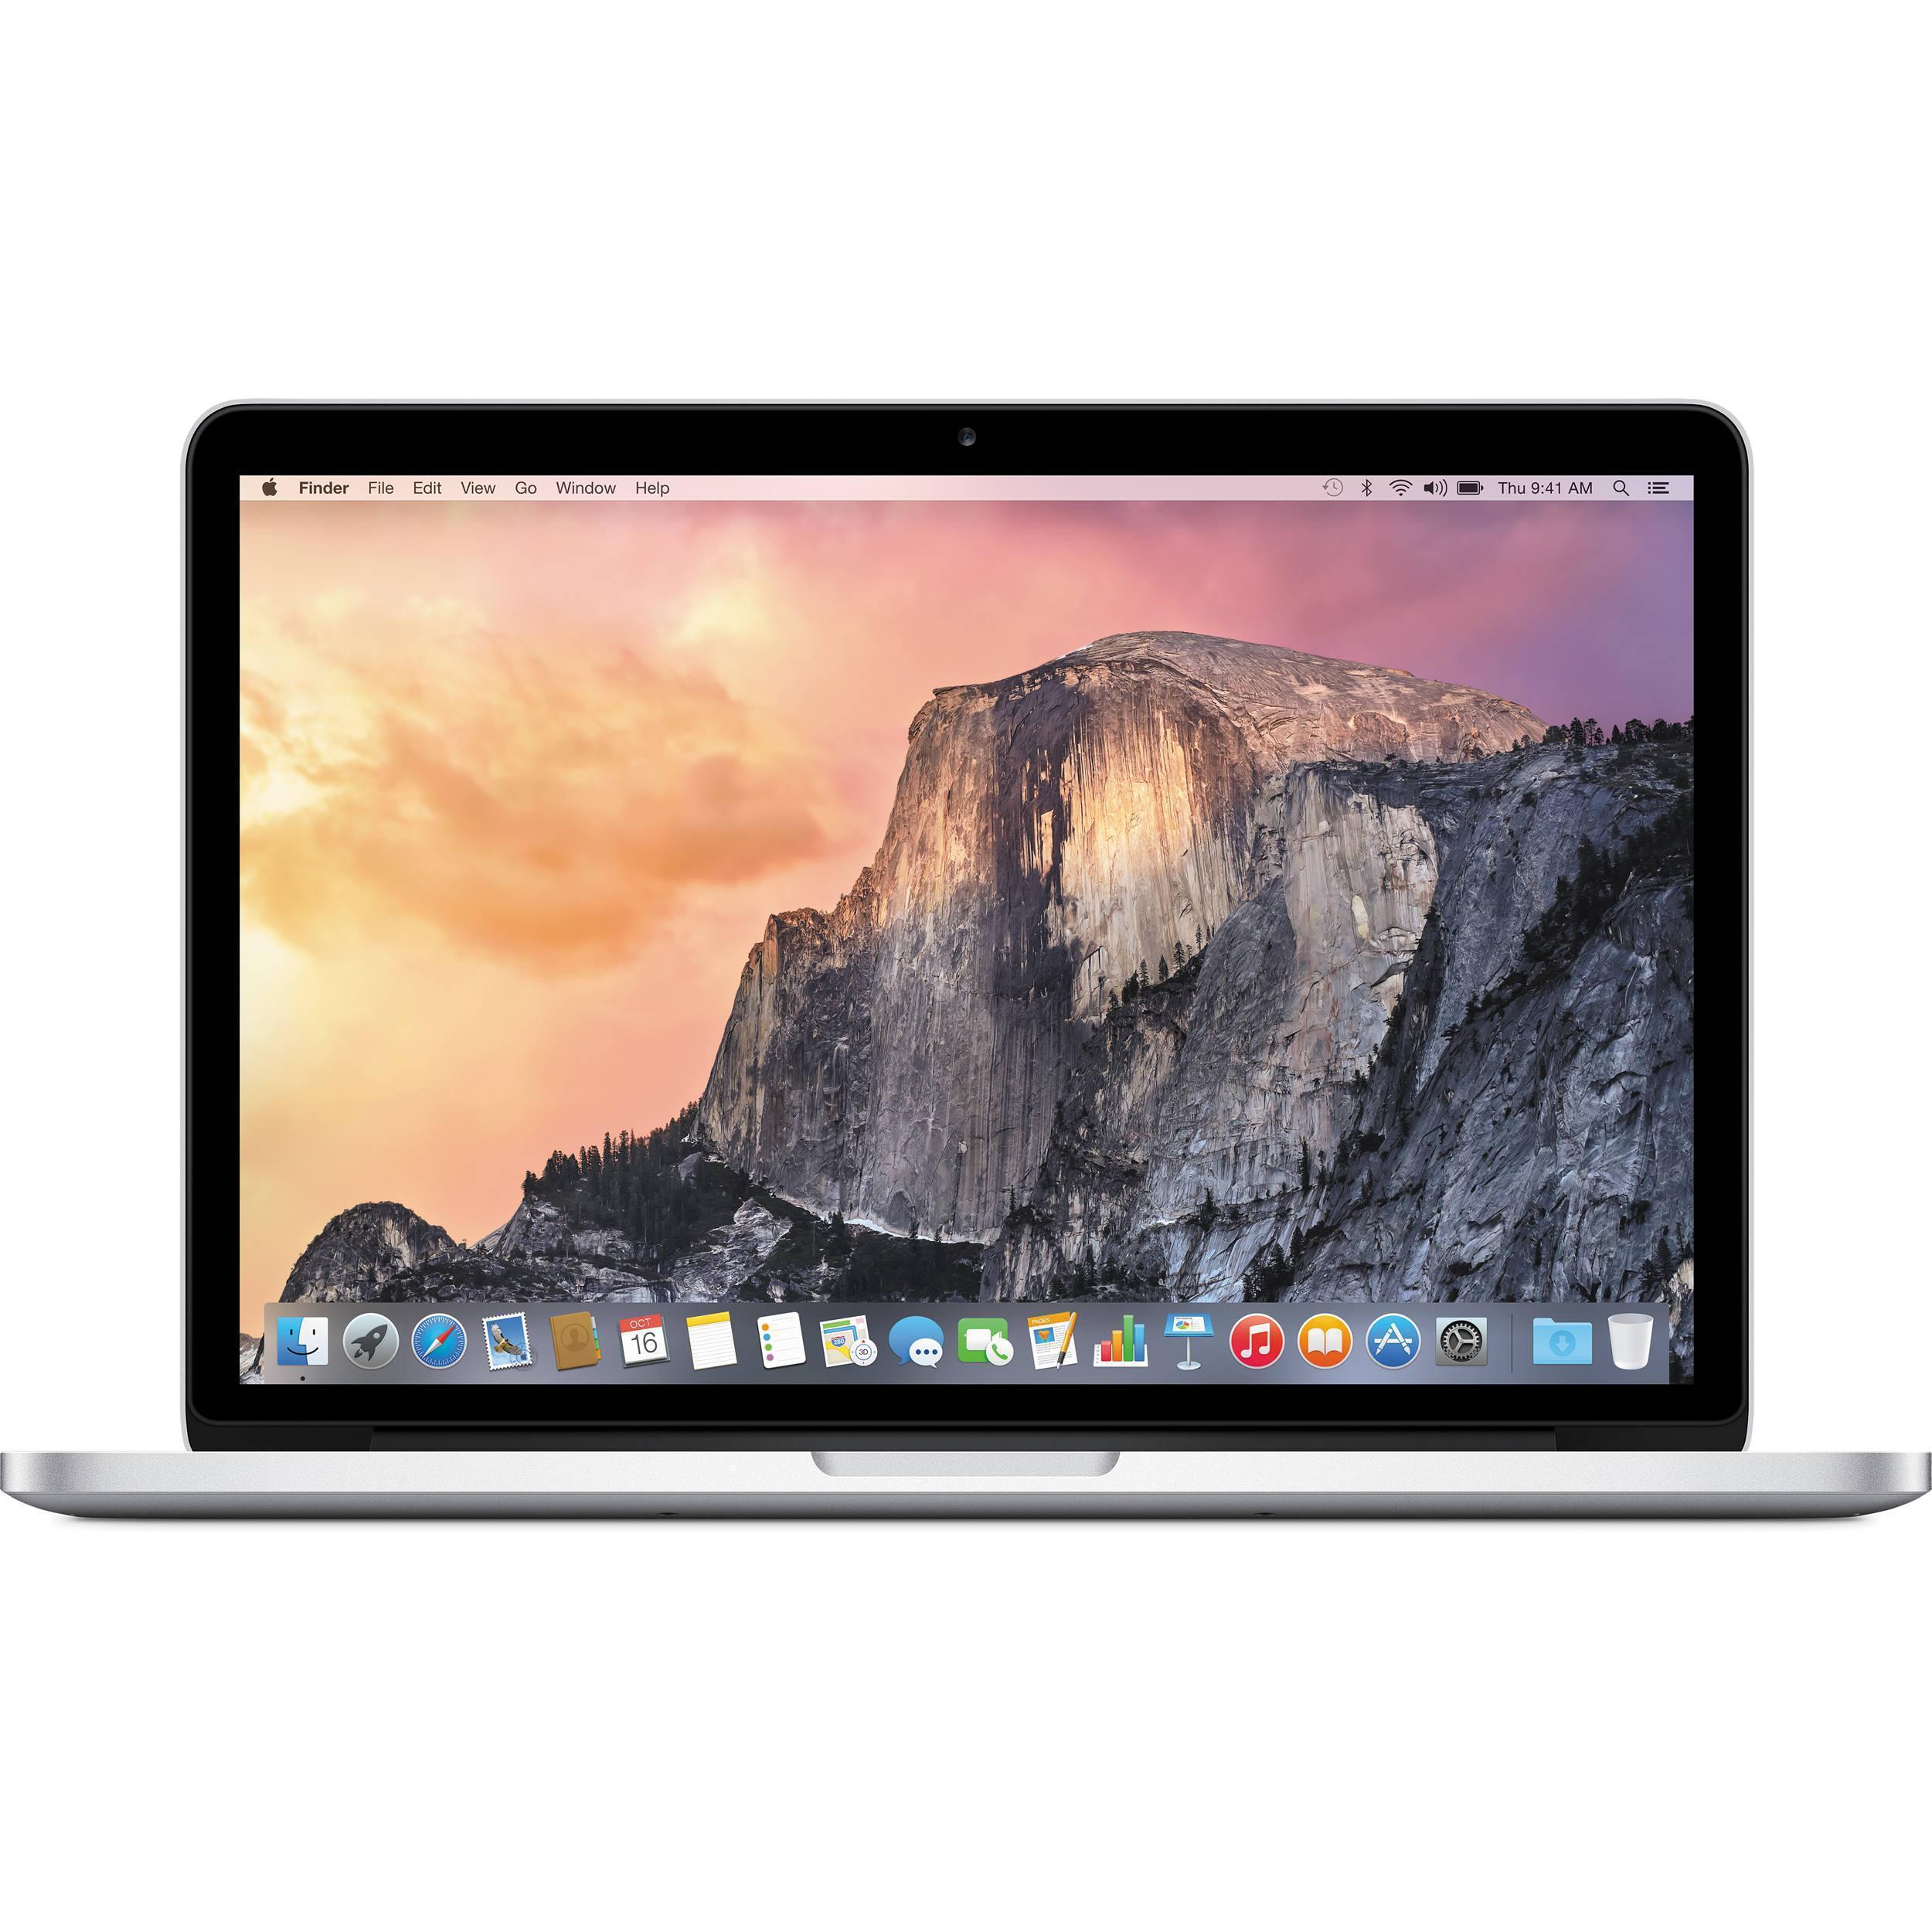 MacBook Pro Retina 13,3-tum (2013) - Core i7 - 16GB - SSD 256 GB AZERTY - Fransk